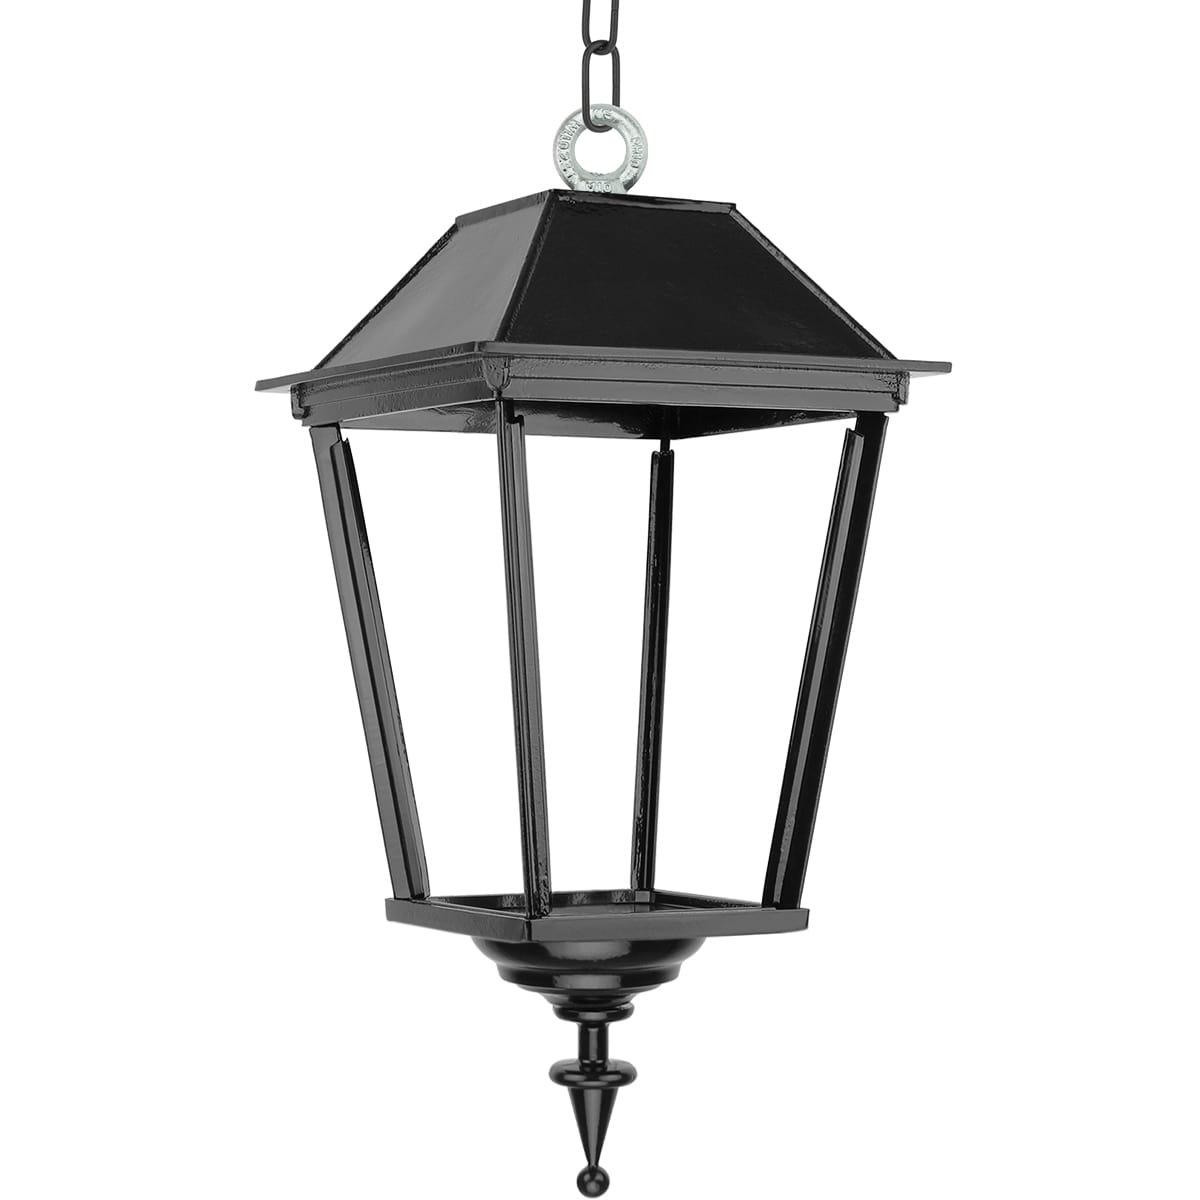 Outdoor lighting Classic Rural Ceiling lamp Dokum on chain L - 55 cm